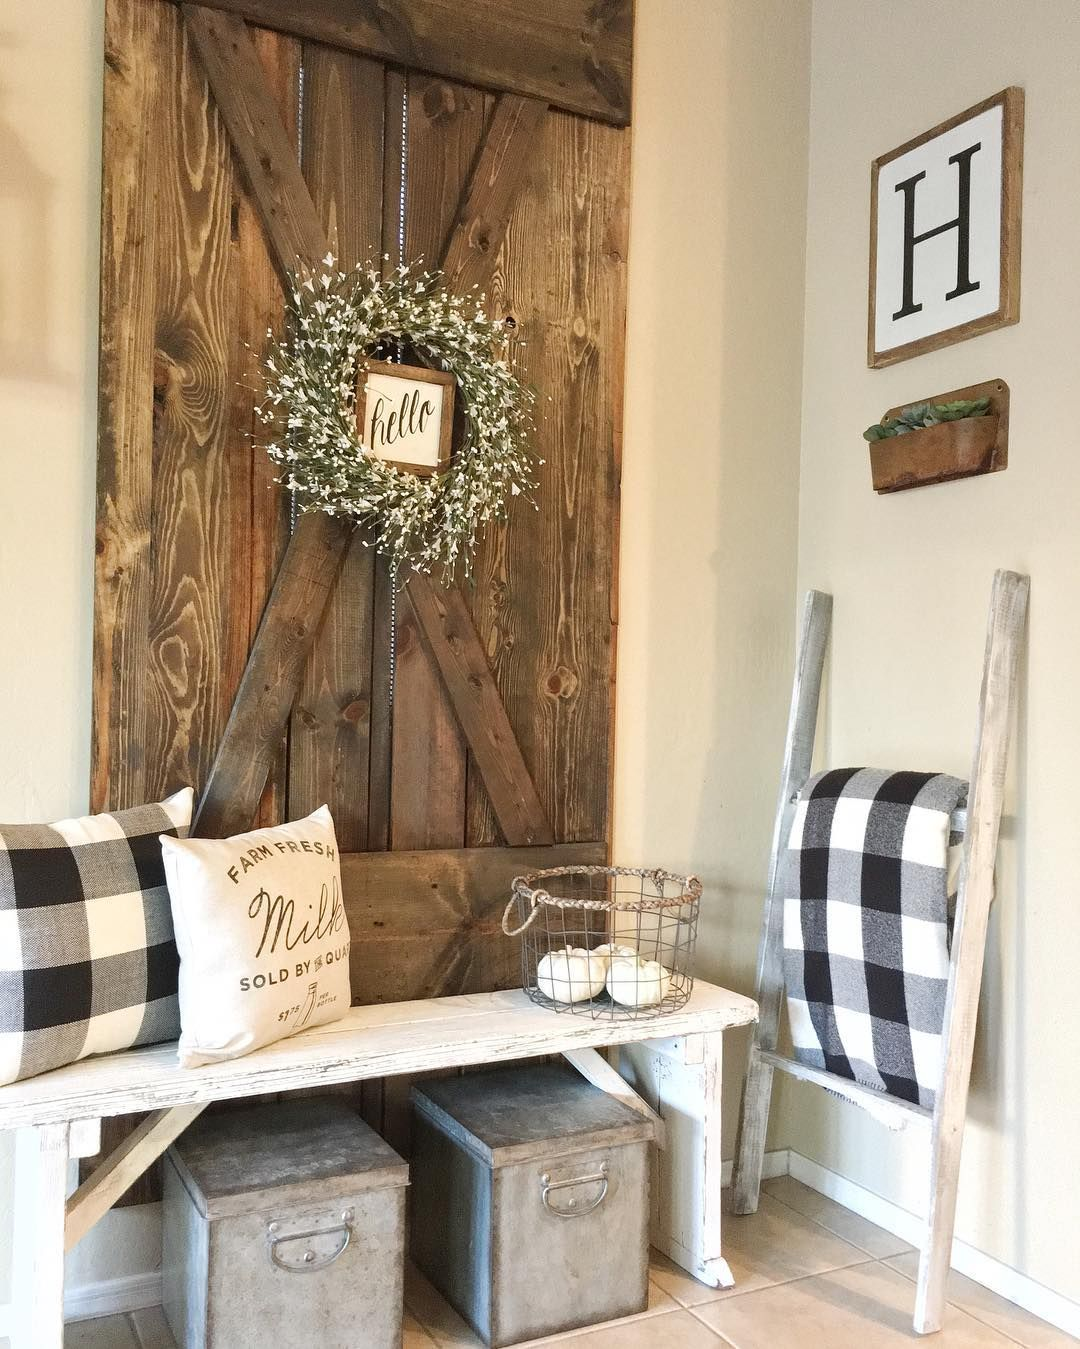 30 Wall Decor Ideas For Your Home: Jaci Hodge (@shabbydesertnest) • Instagram Photos And